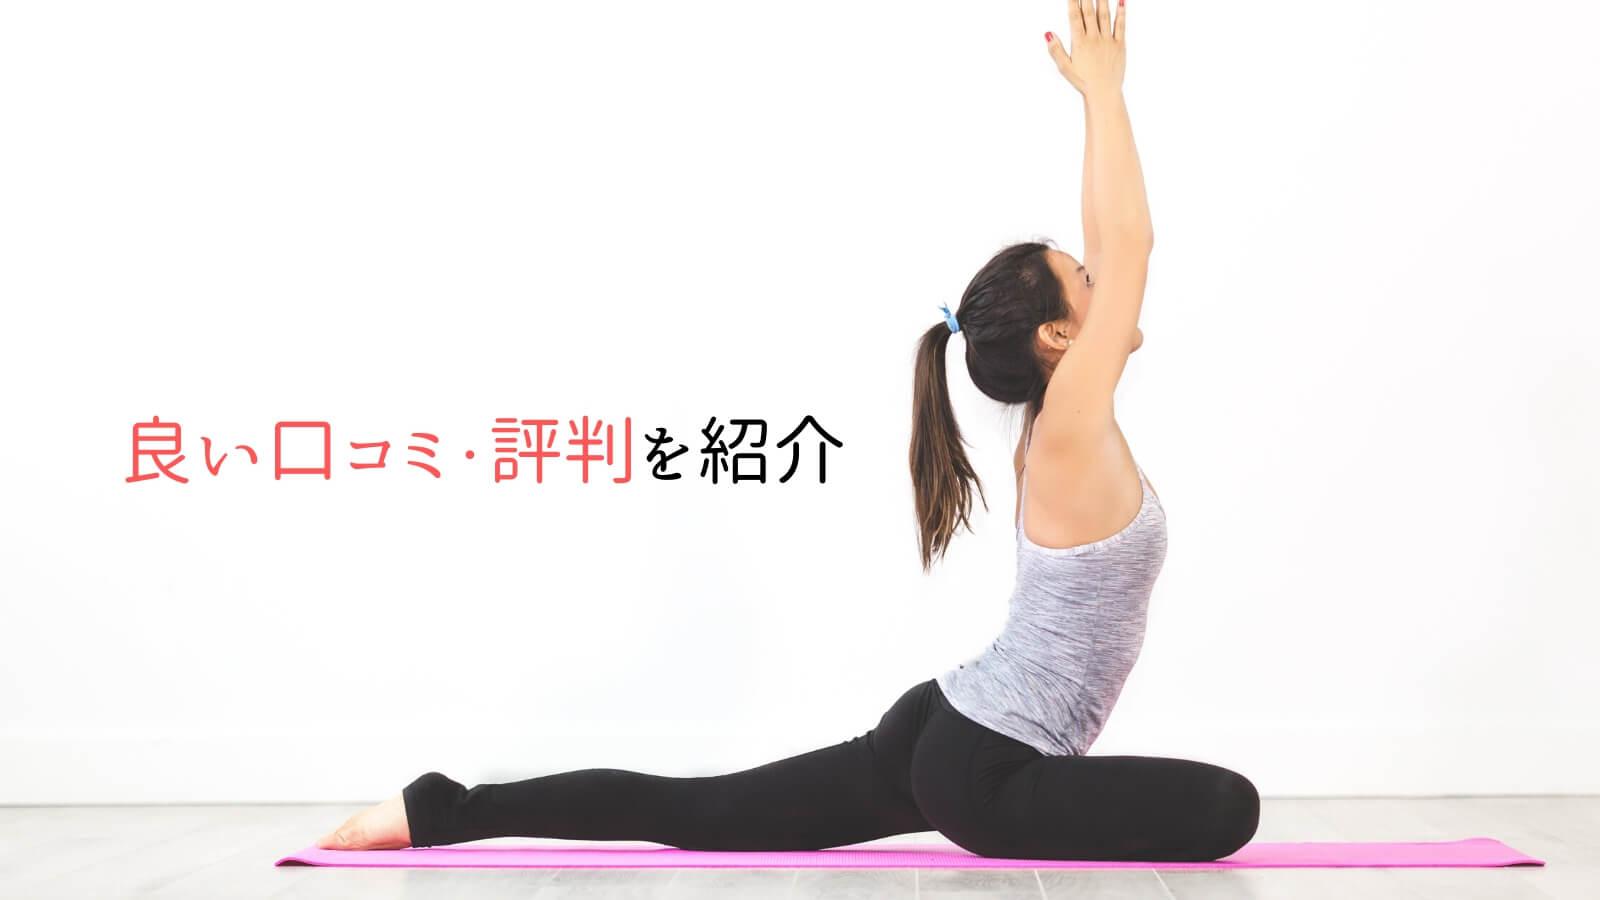 zen place pilates by BASI Pilatesの良い口コミ・評判を紹介